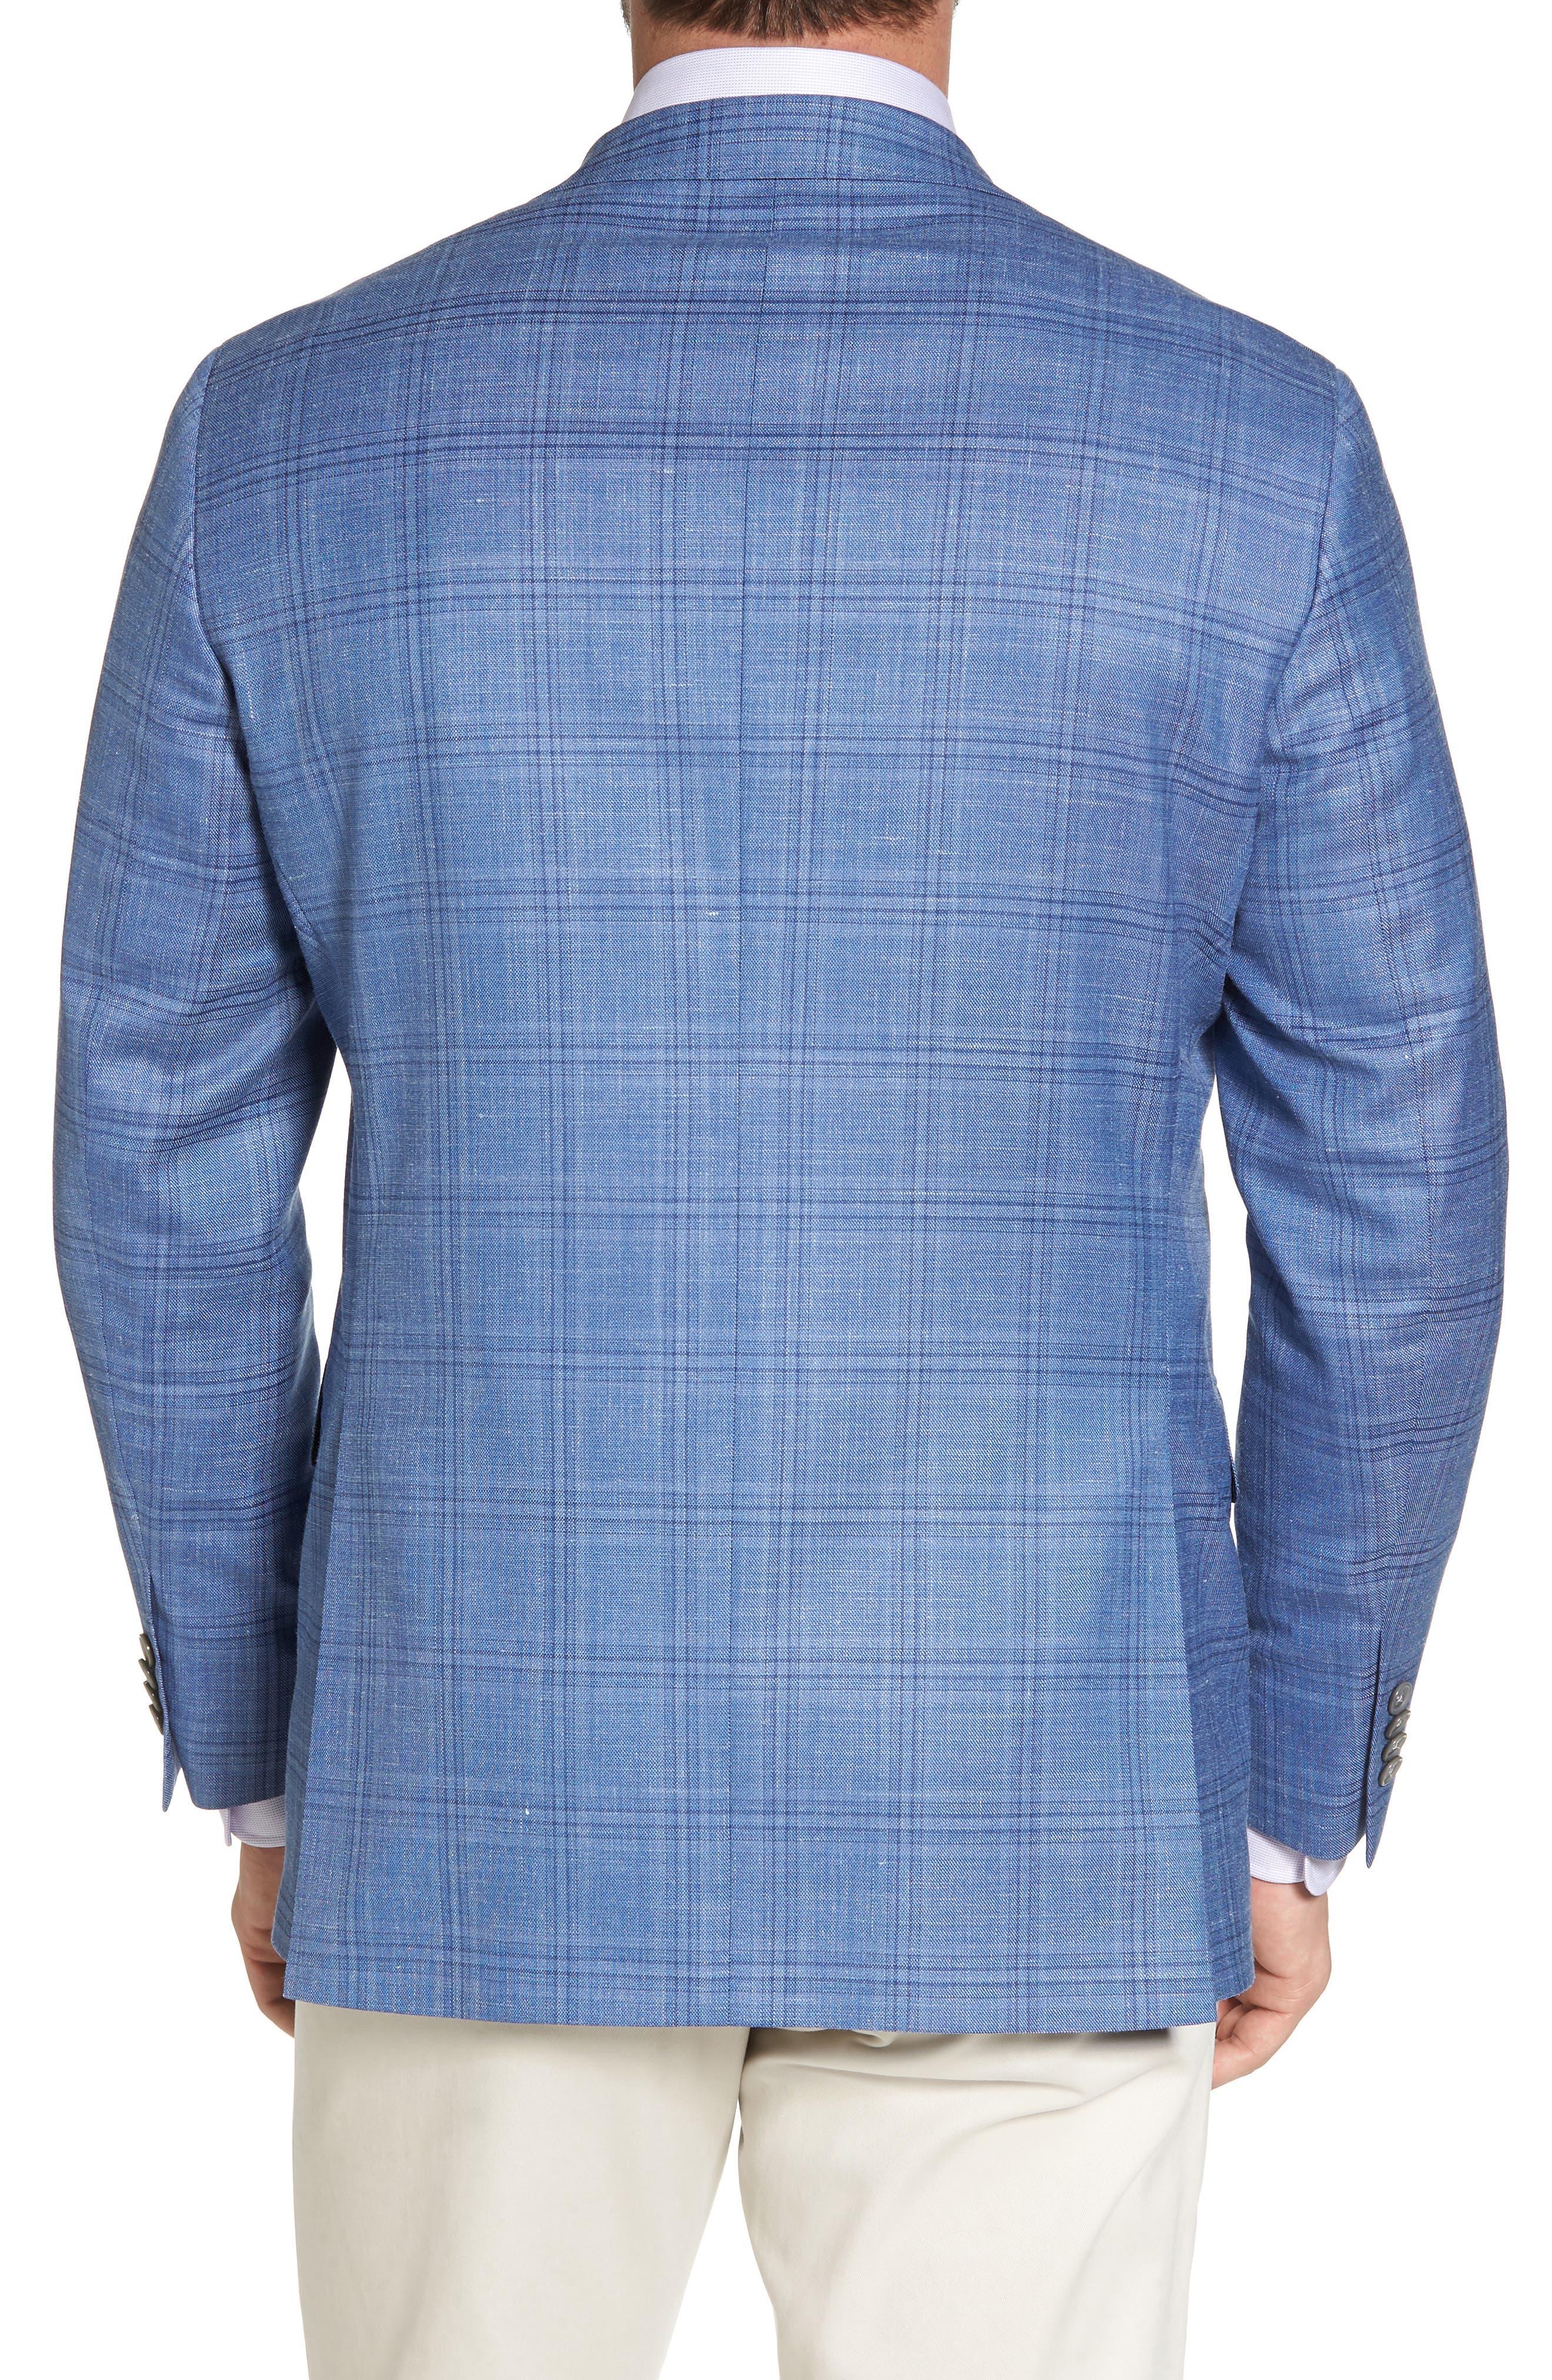 Arnold Classic Fit Plaid Wool Blend Sport Coat,                             Alternate thumbnail 2, color,                             Blue